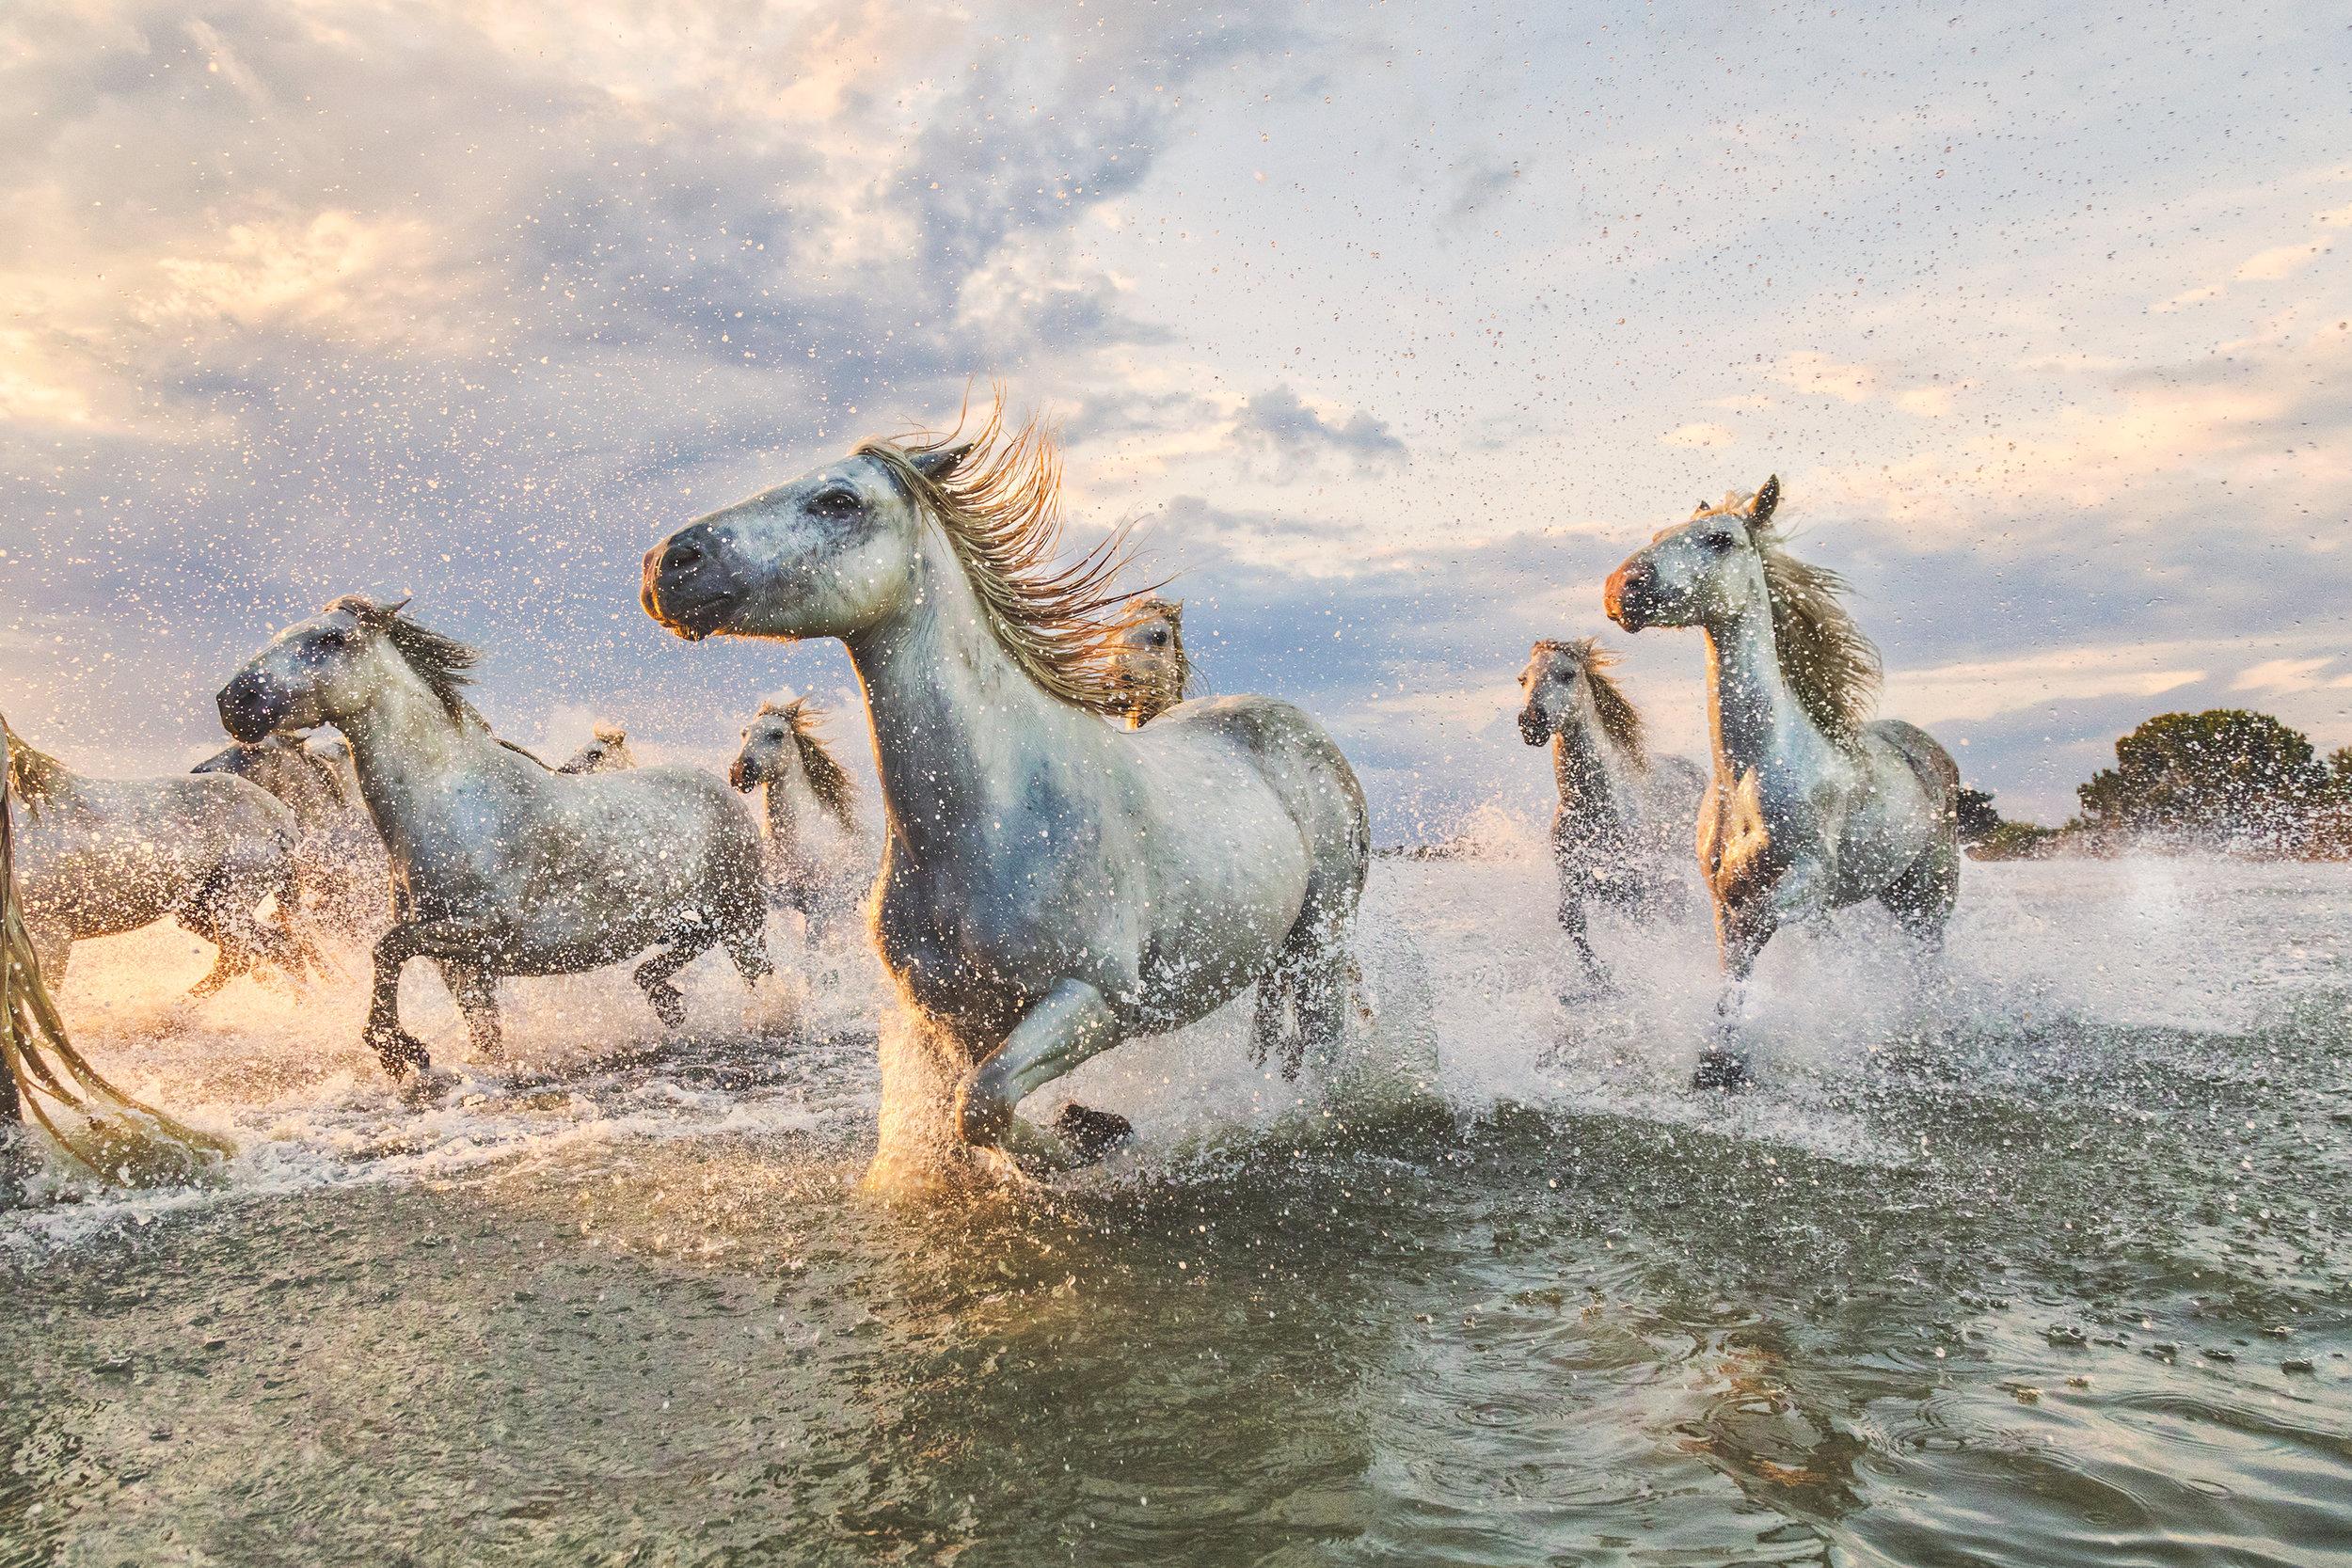 camargue_horses_france.jpg